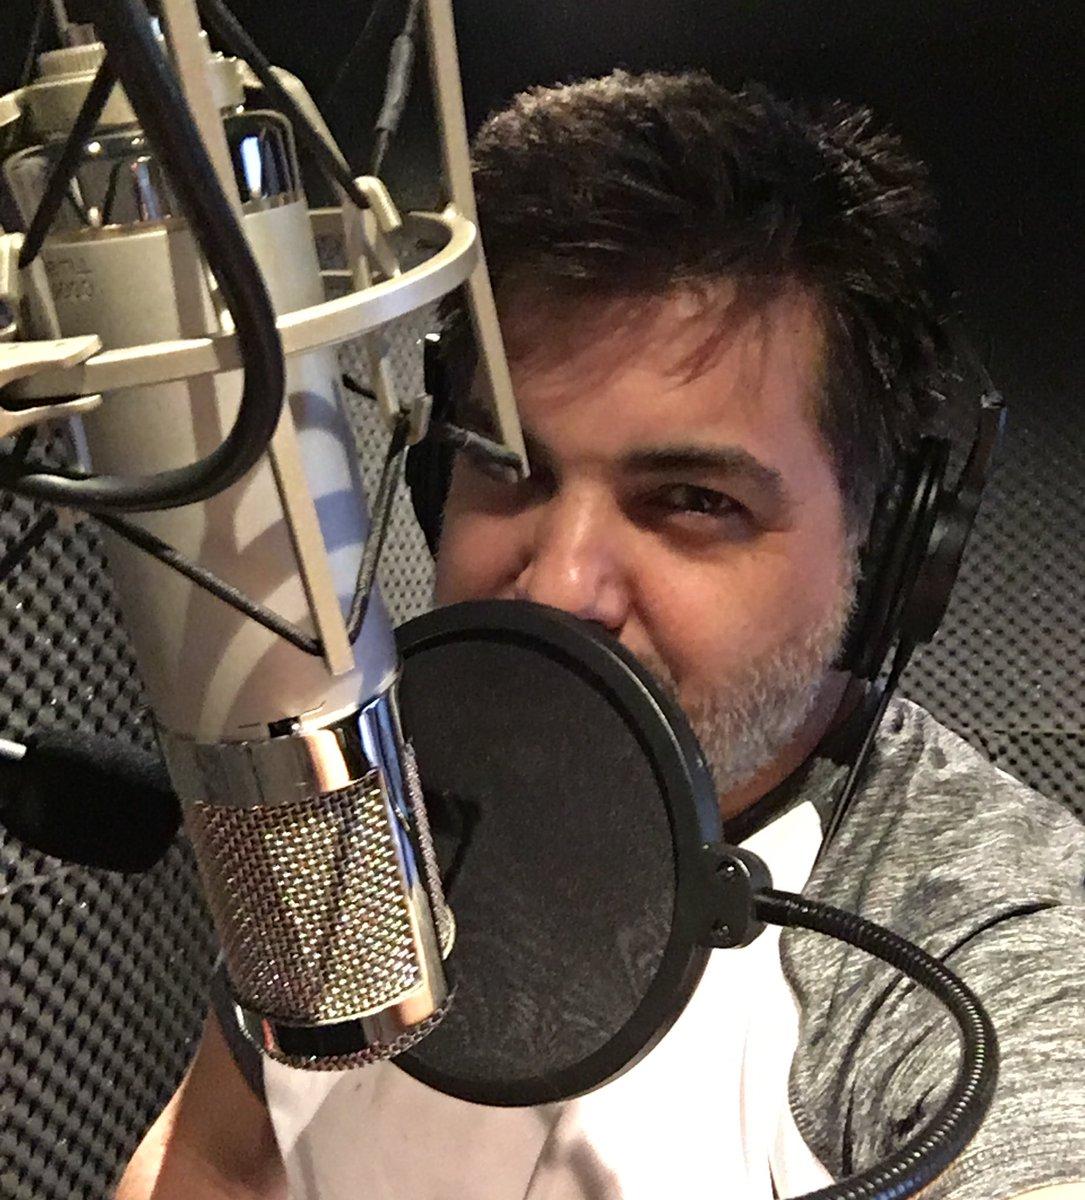 Geceden sabaha #podcast kayıt. #makale #seslendirme https://t.co/iUZFh4tdgs